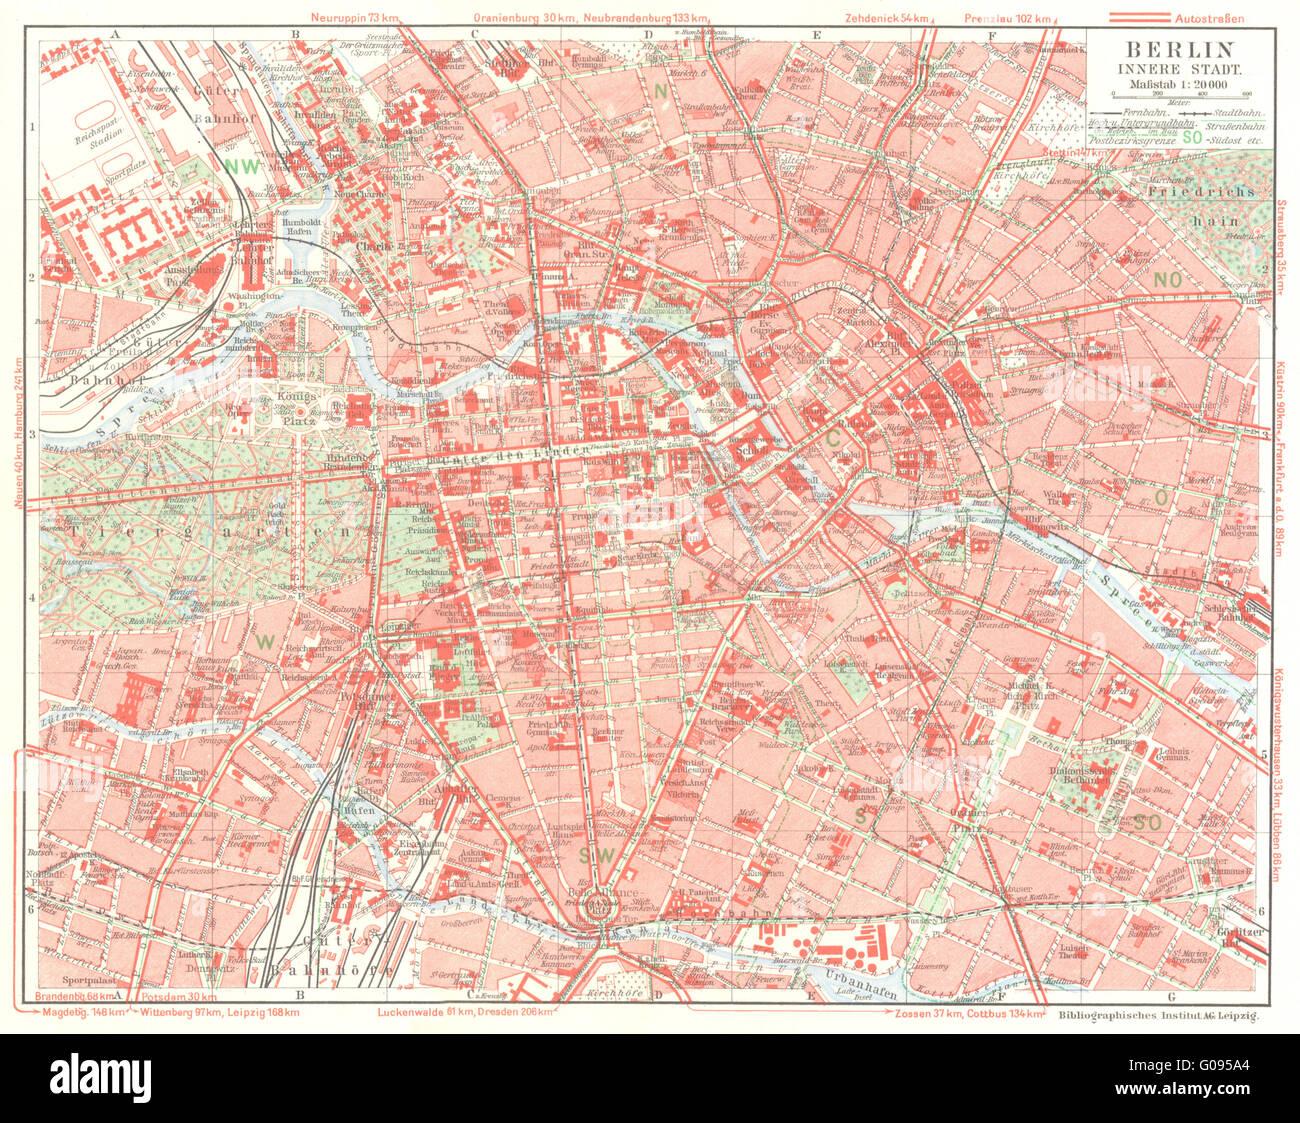 GERMANY Vintage 1930 Color Map